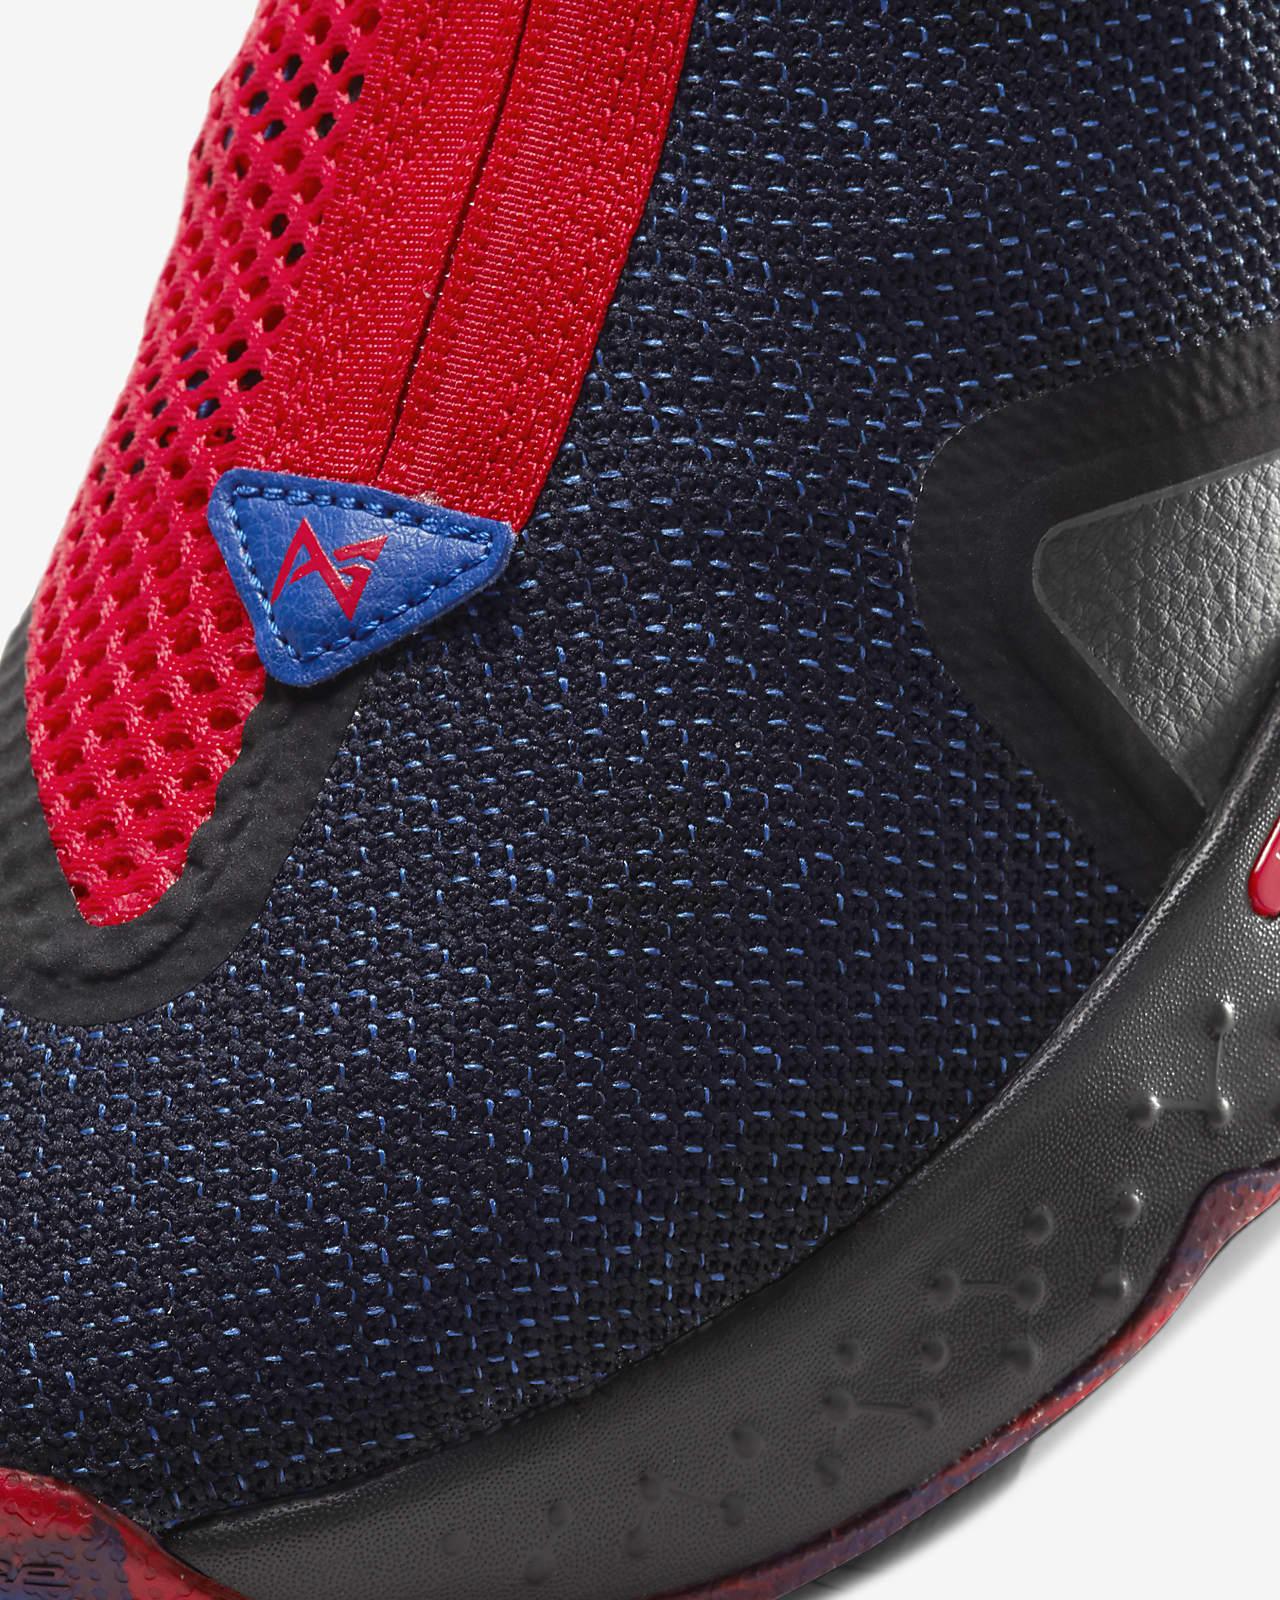 PG 4 EP Basketball Shoe. Nike ID